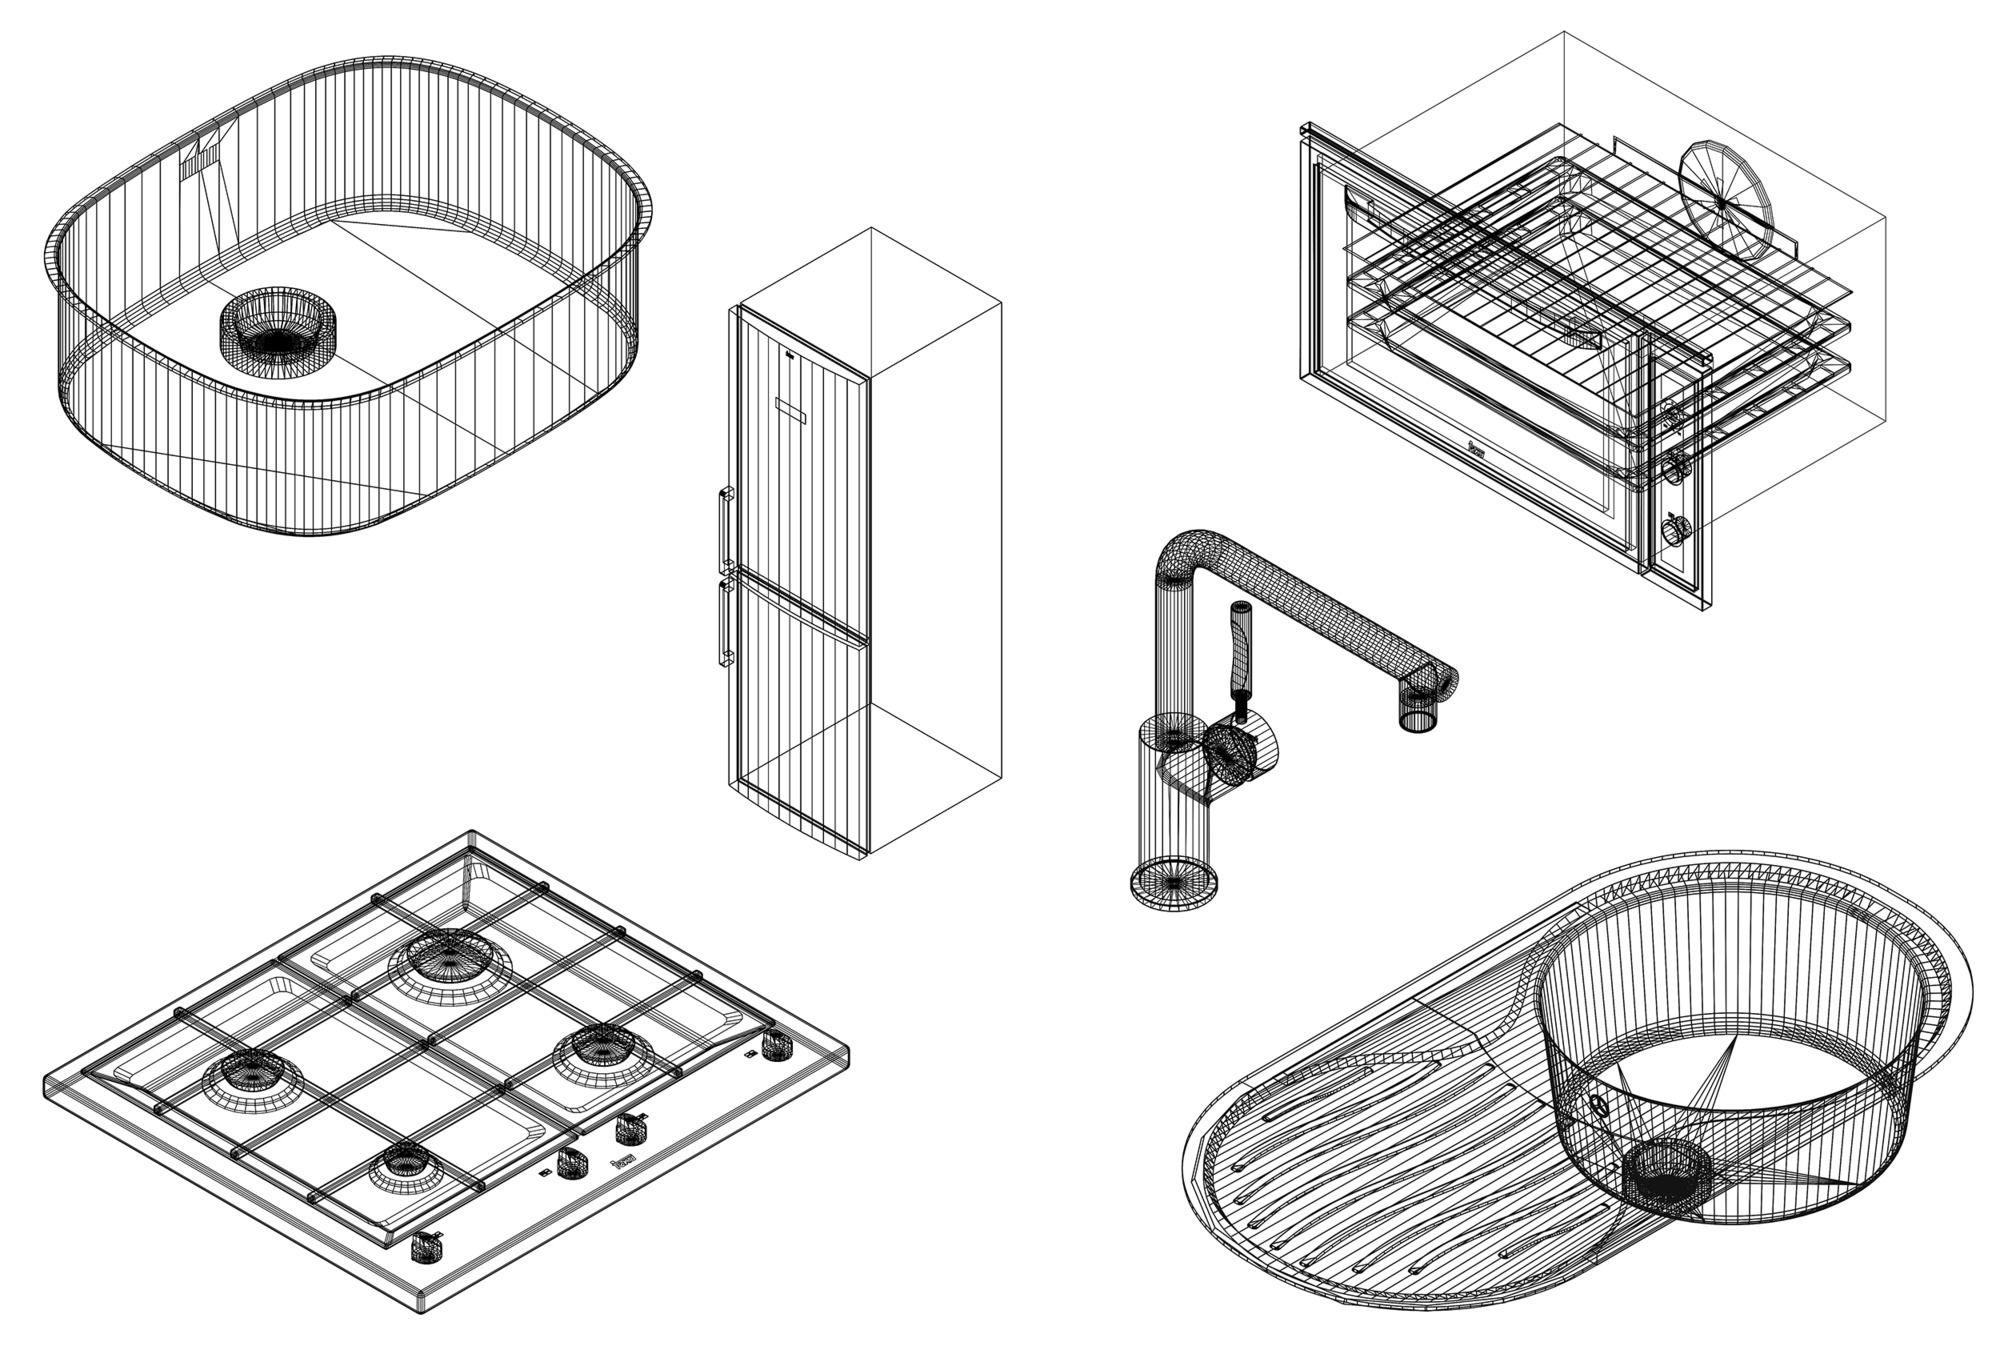 Kitchen Design Dwg stoves, sinks, and refrigerators: downloadable cad blocks for